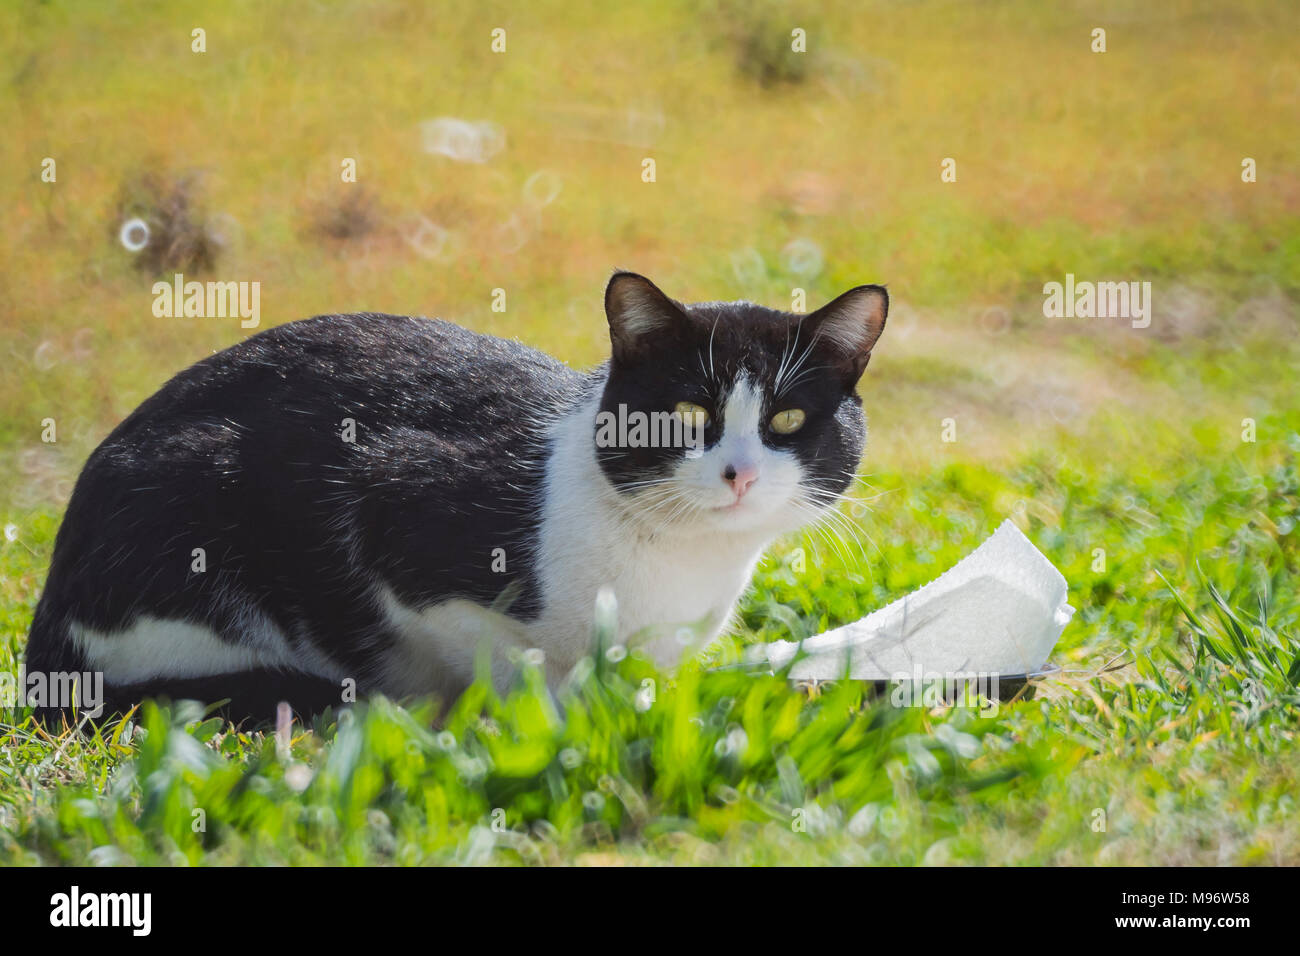 Close up shot of Tuxedo cat staring at you, photo took at Los Angeles - Stock Image